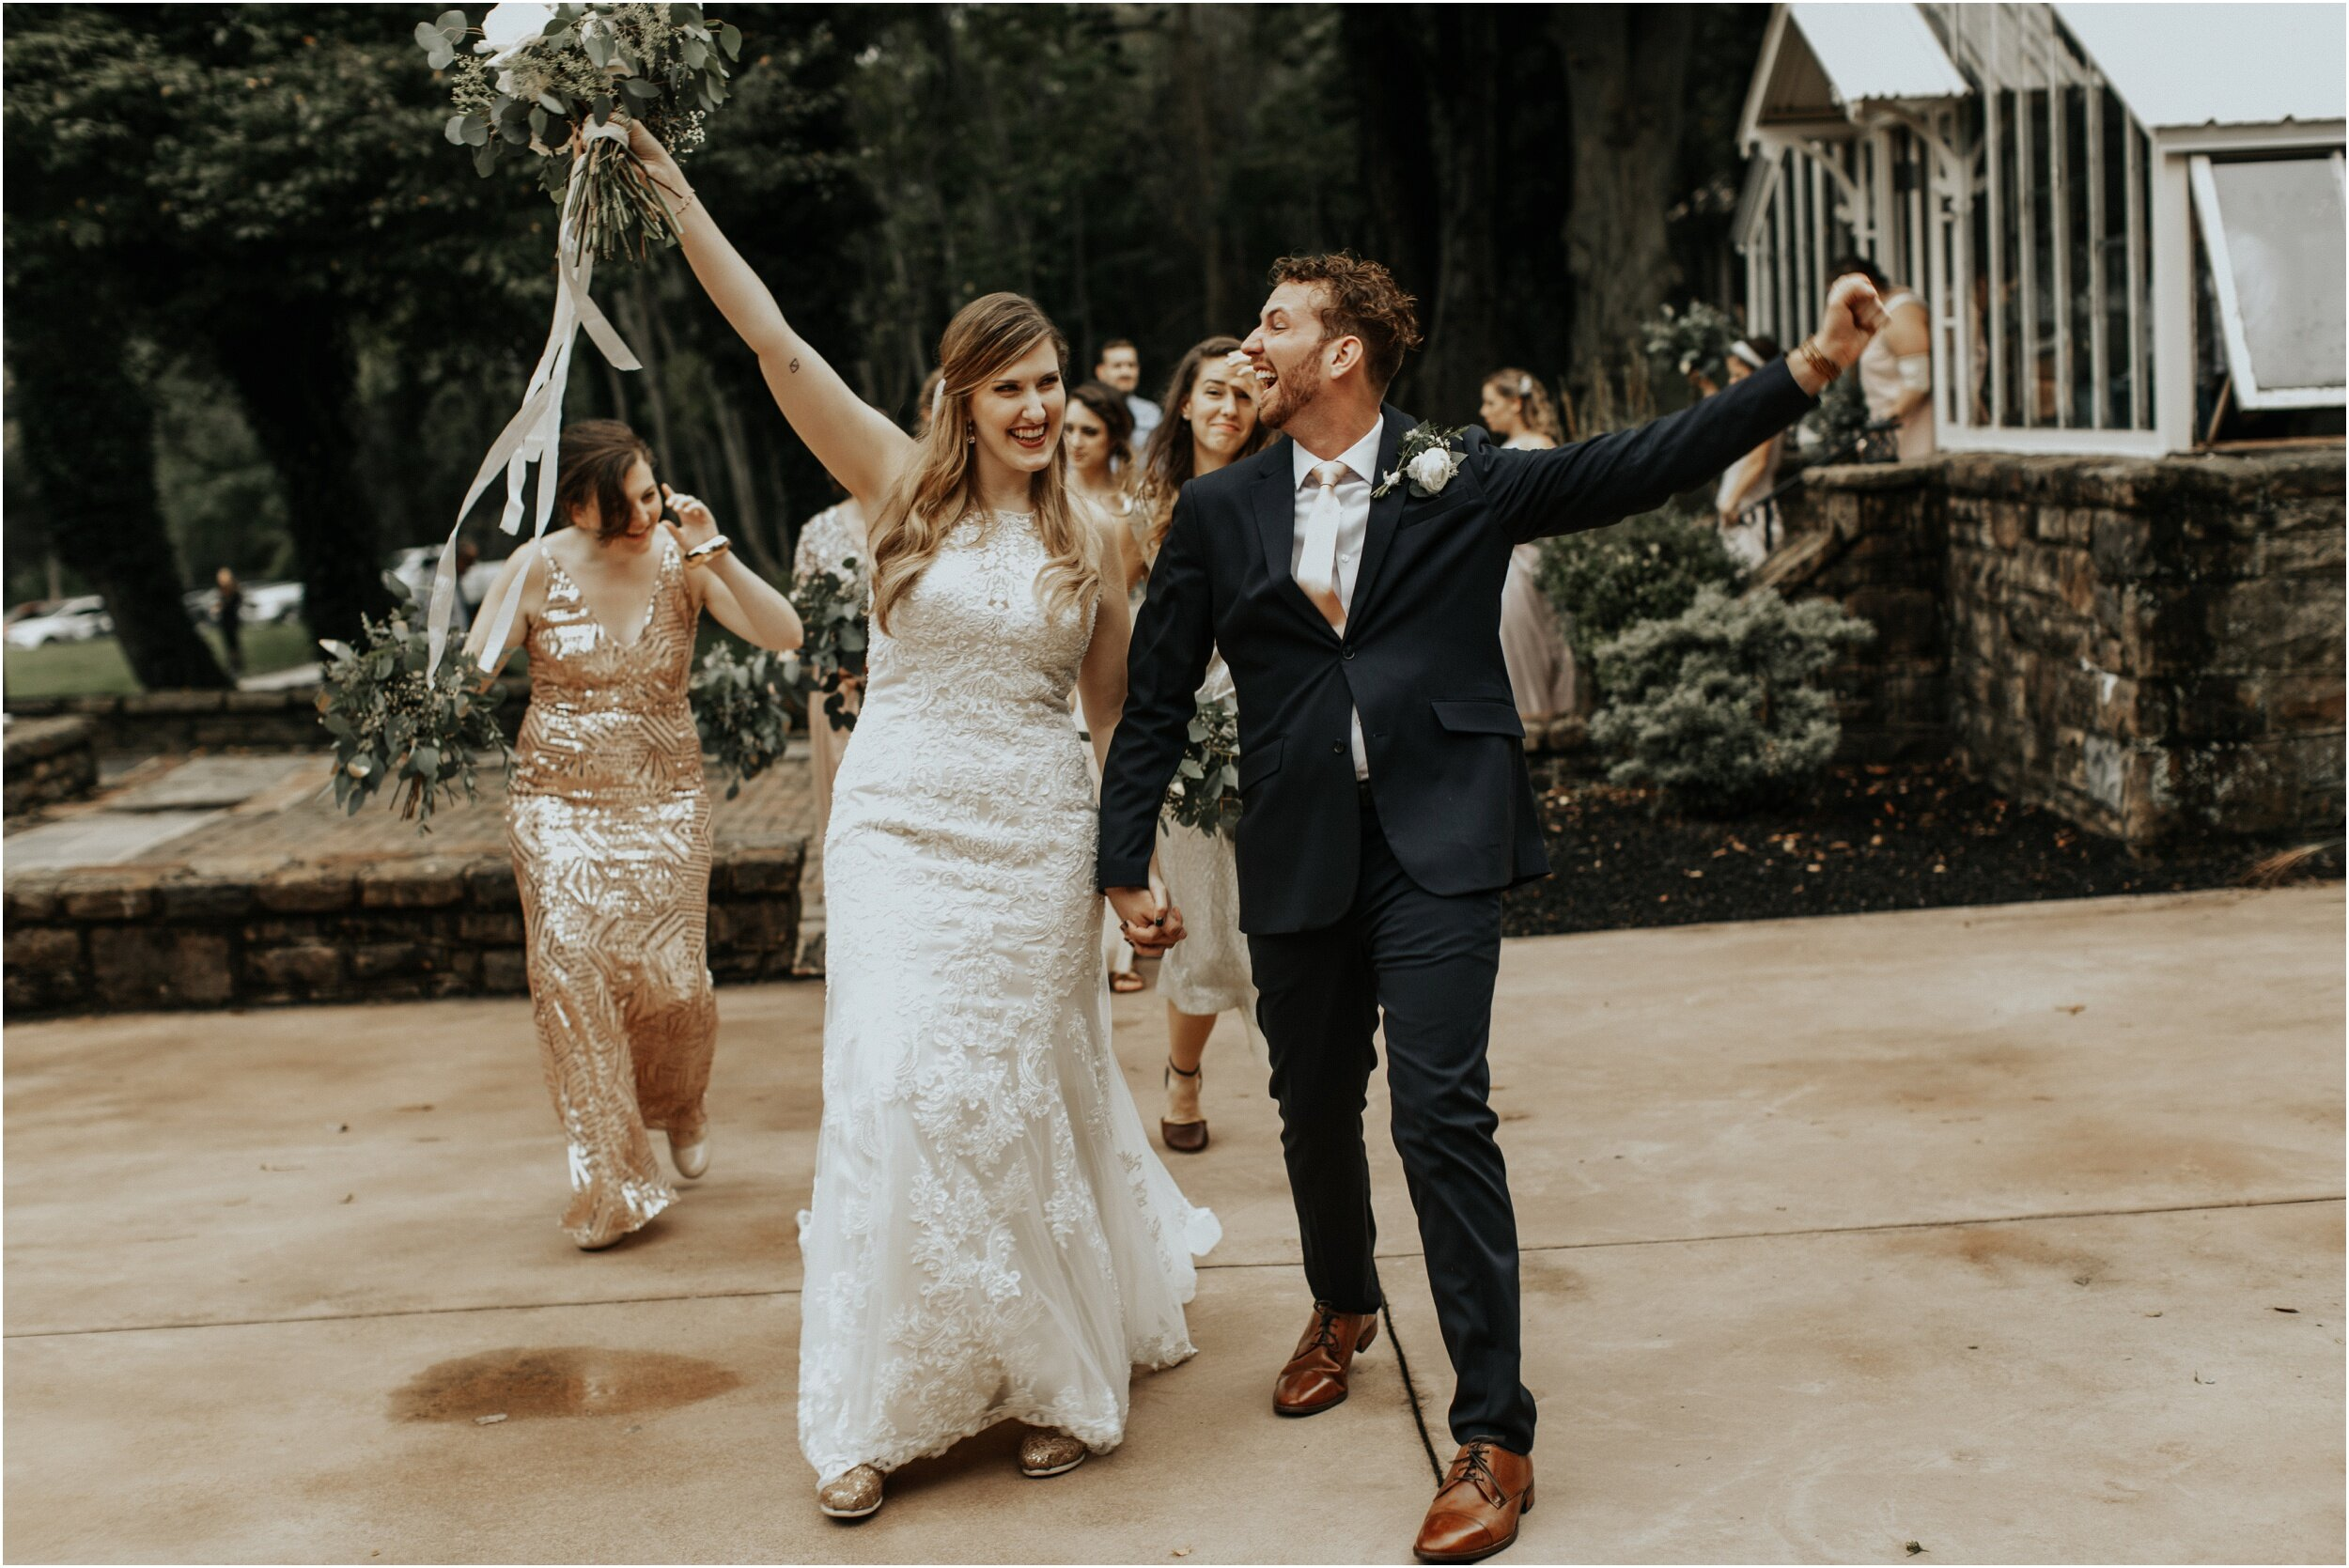 steph-and-jordan-cox-our-wedding-historic-shady-lane-compass-wedding-collective-hazel-lining-photography-destination-elopement-wedding-engagement-photography_0040.jpg